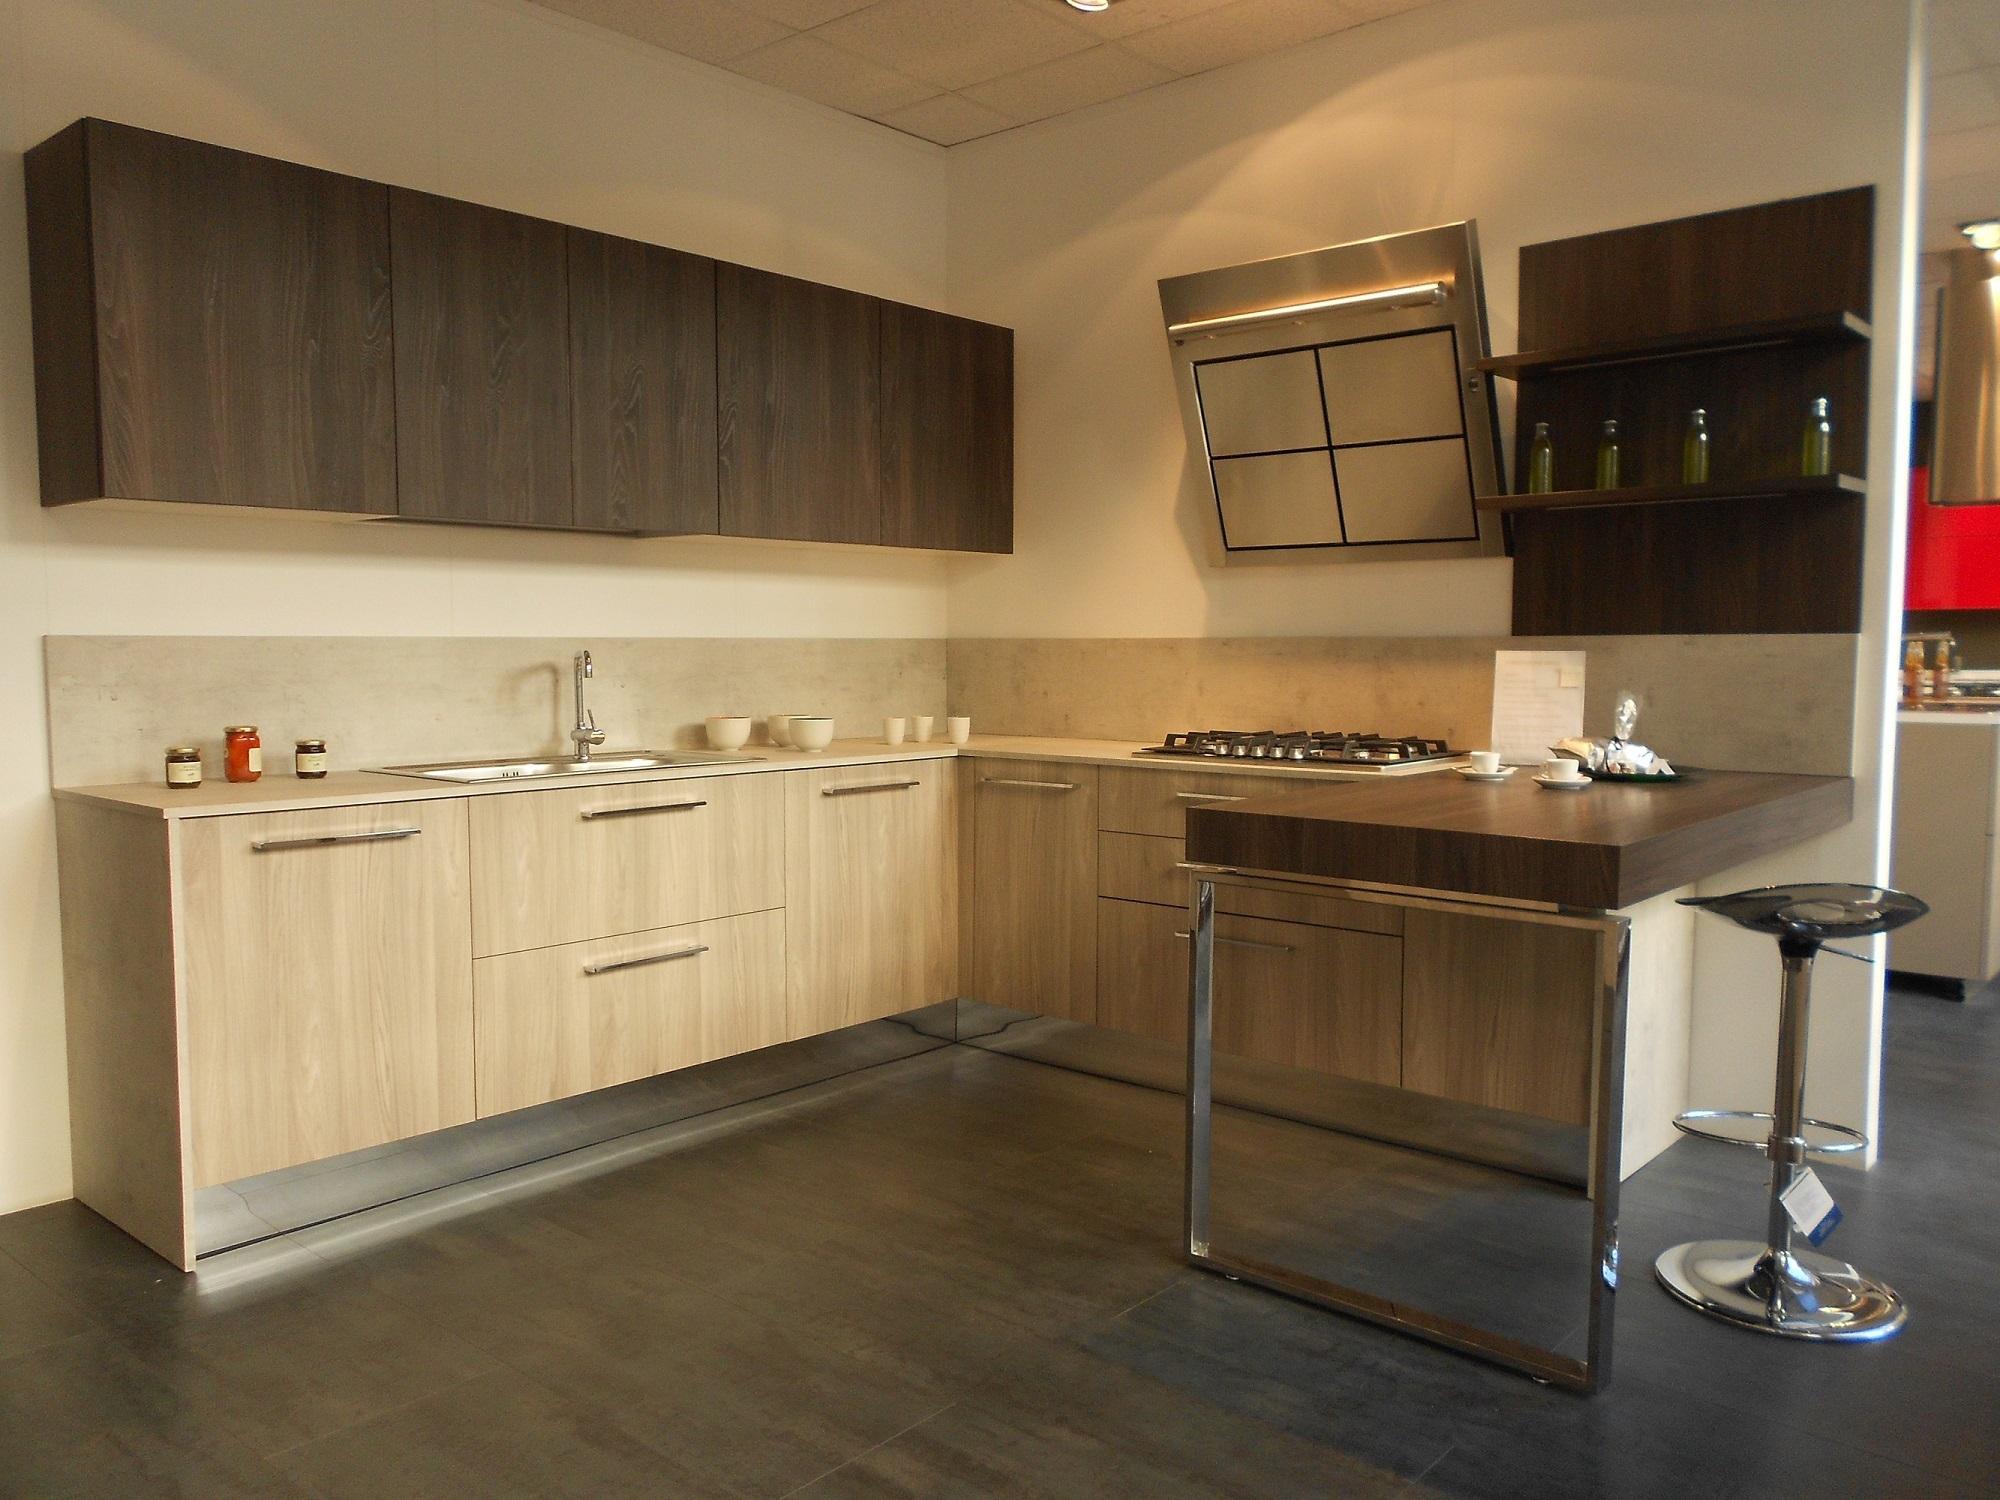 astra cucine cucina sp 22 moderna laminato materico neutra